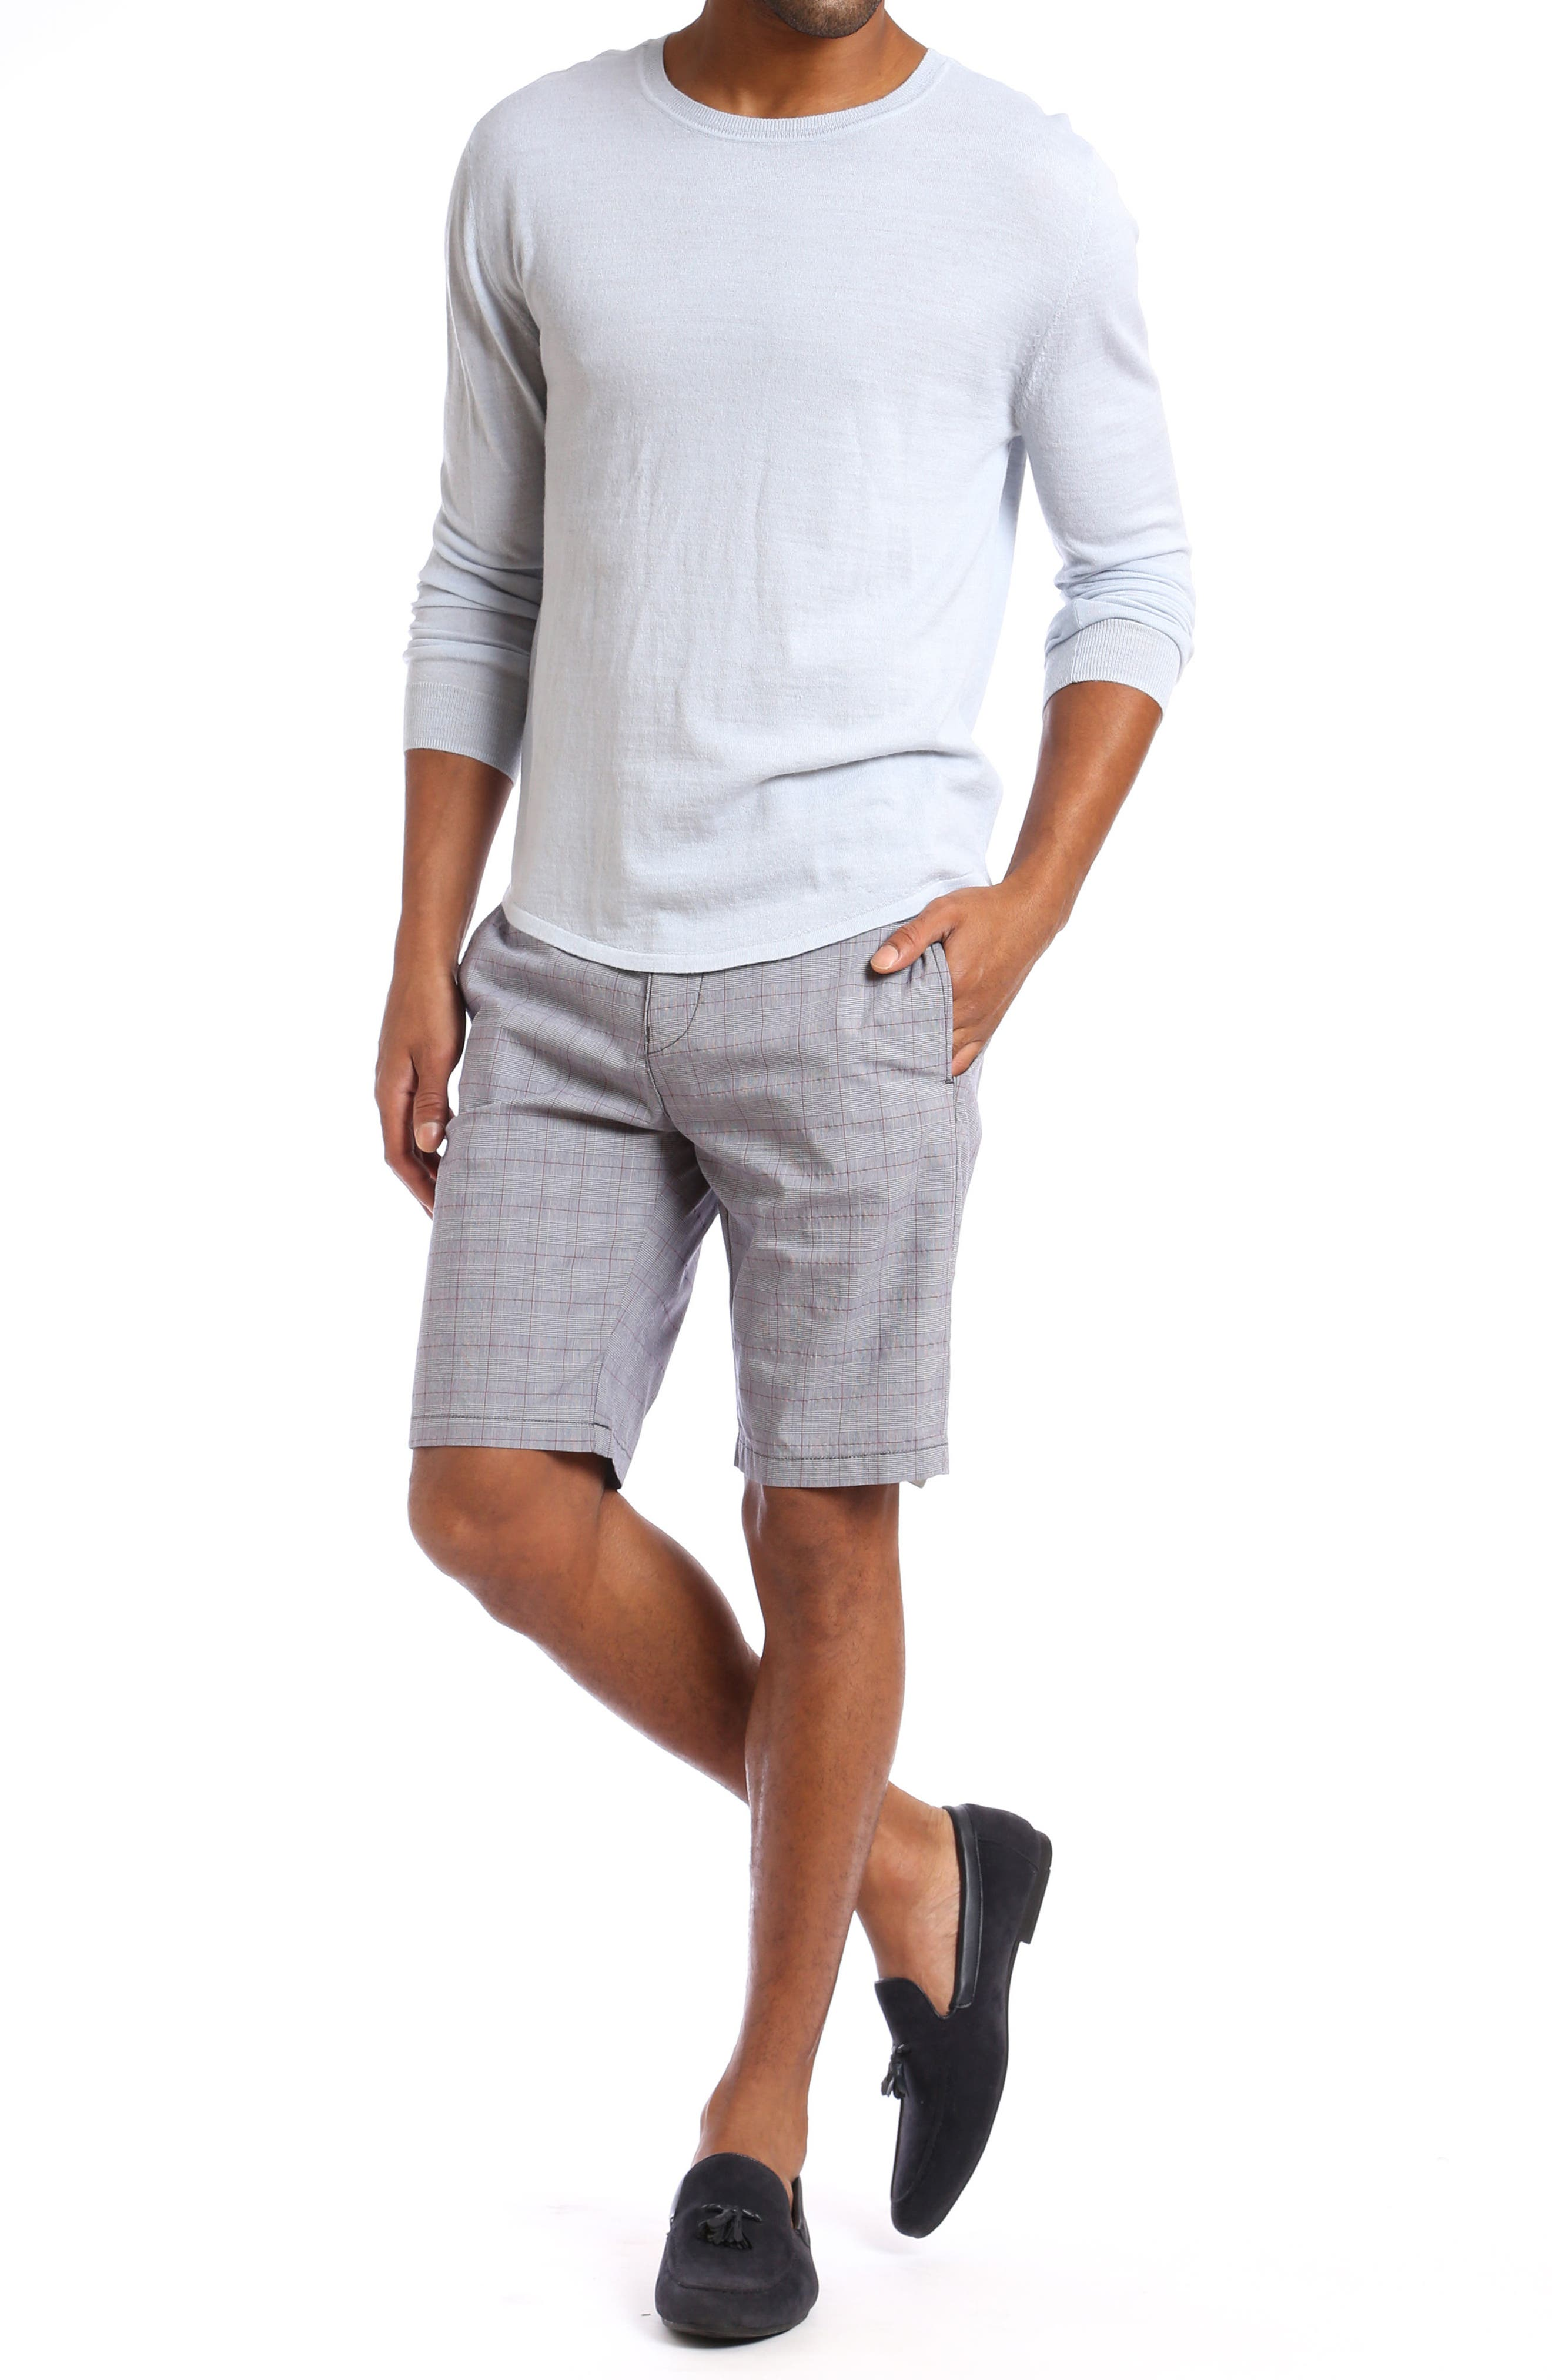 Nevada Twill Shorts,                             Alternate thumbnail 4, color,                             GREY PLAID